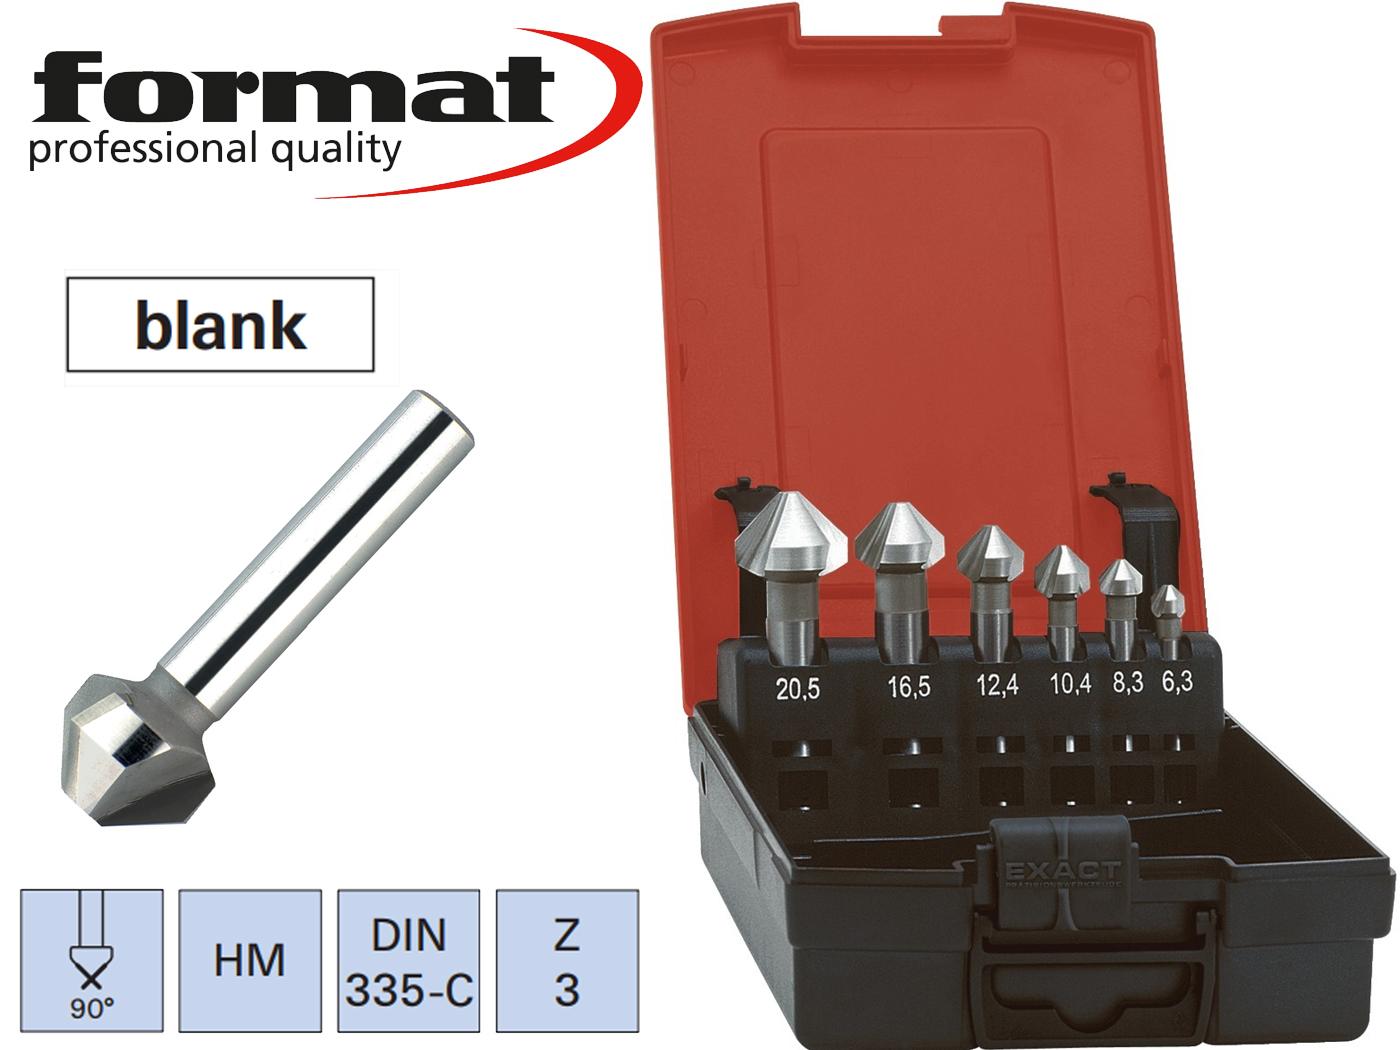 verzinkboor set DIN 335C VHM 90G FORMAT   DKMTools - DKM Tools